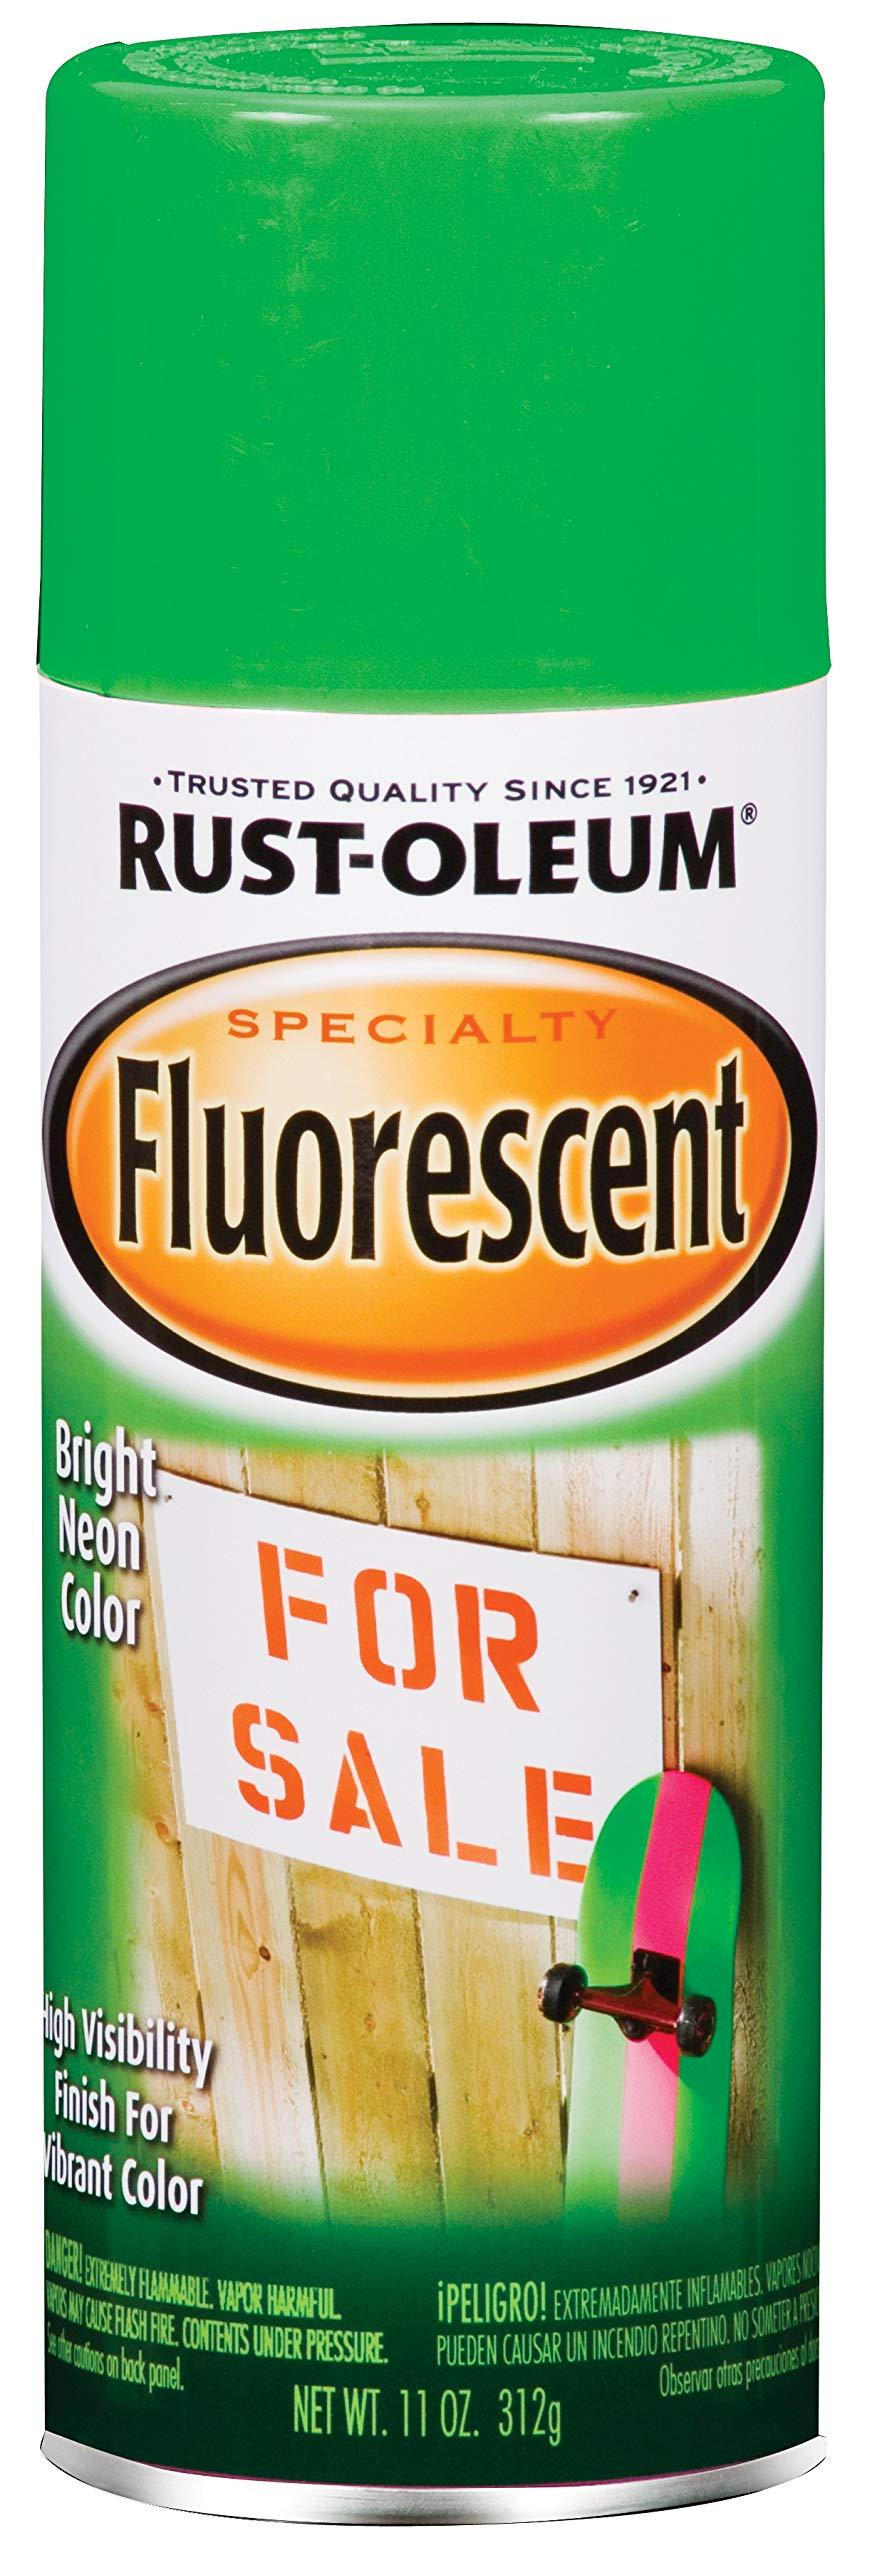 Rust-Oleum 1932830 Specialty Fluorescent Spray Paint, 11-Ounce, Green